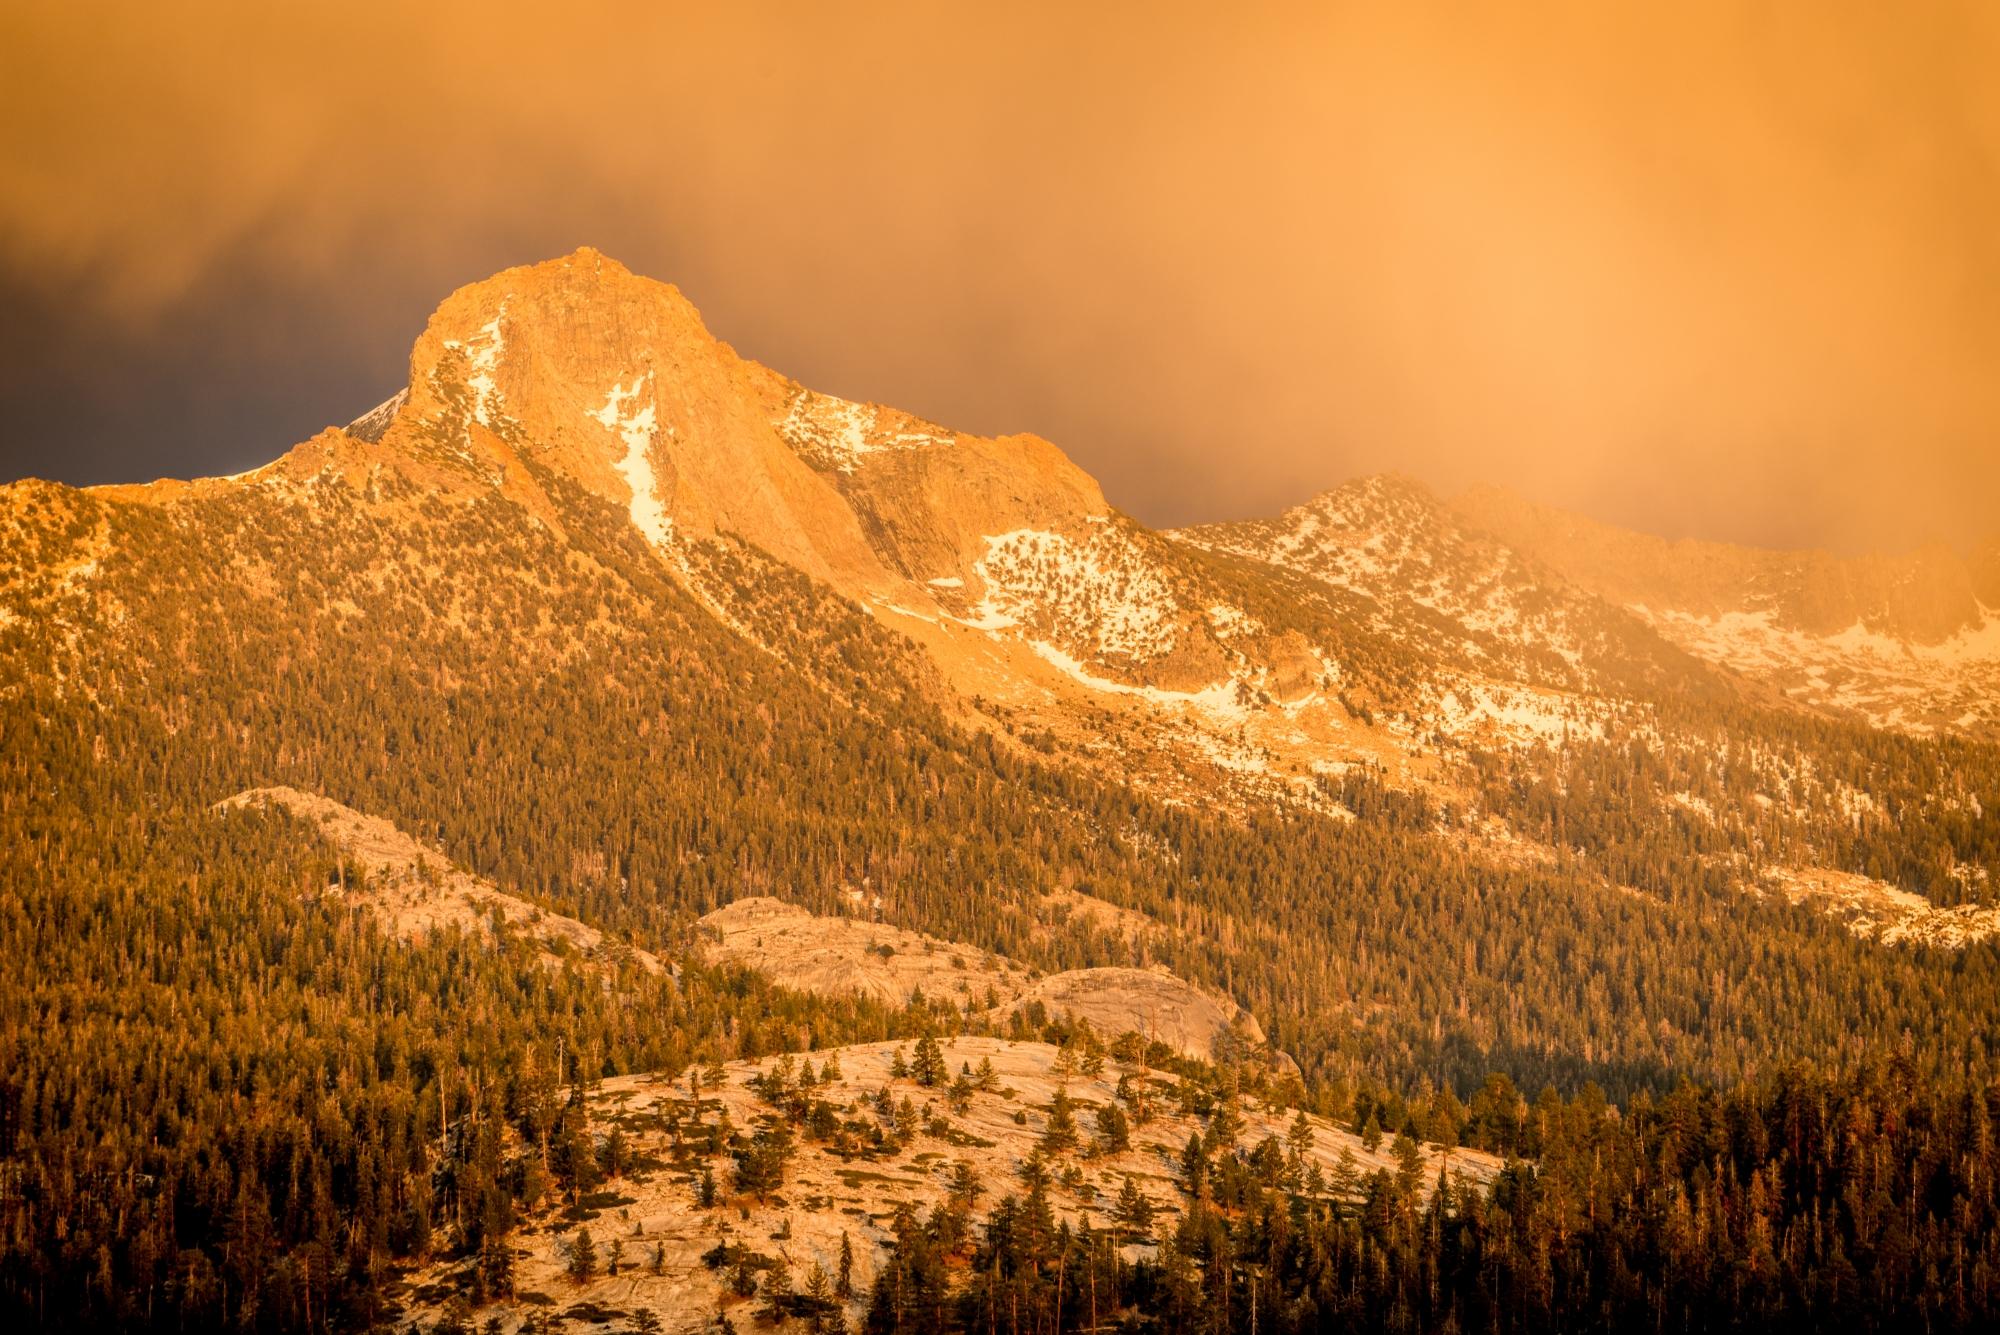 DSC5844 - Colorful Evening Light, Mount Clark, Yosemite